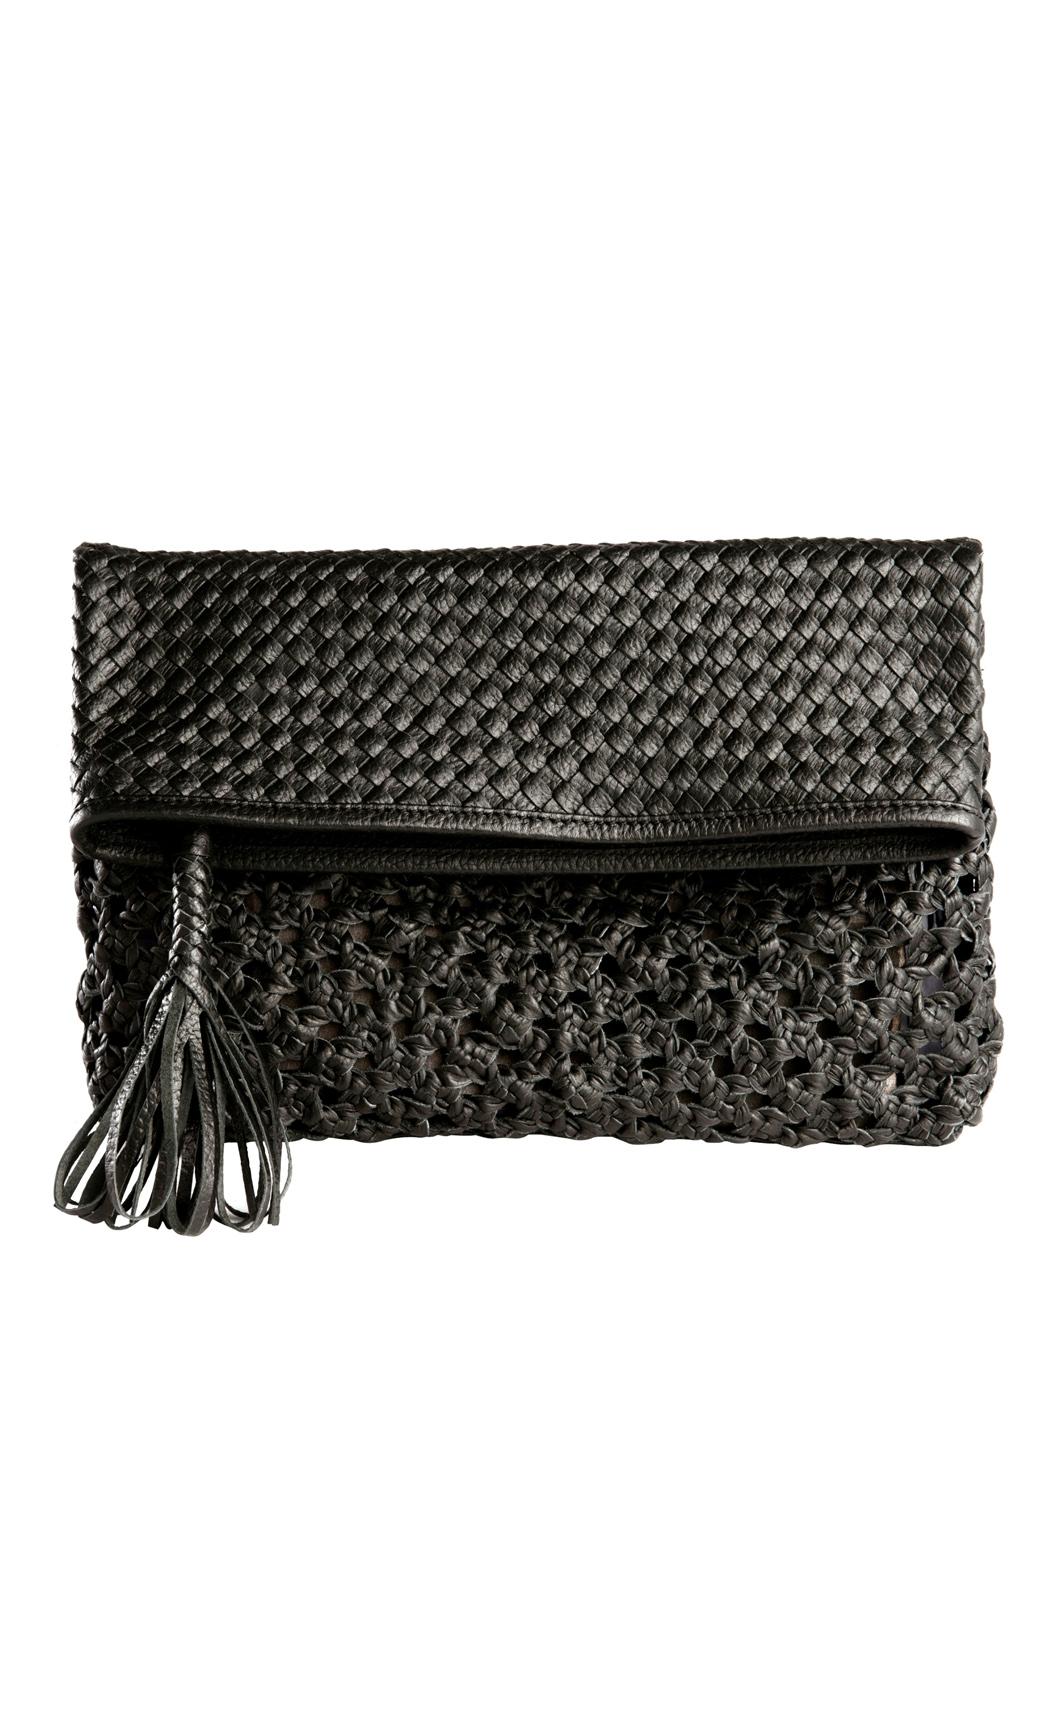 Classic Weave Foldover Clutch in Black. Buy Online